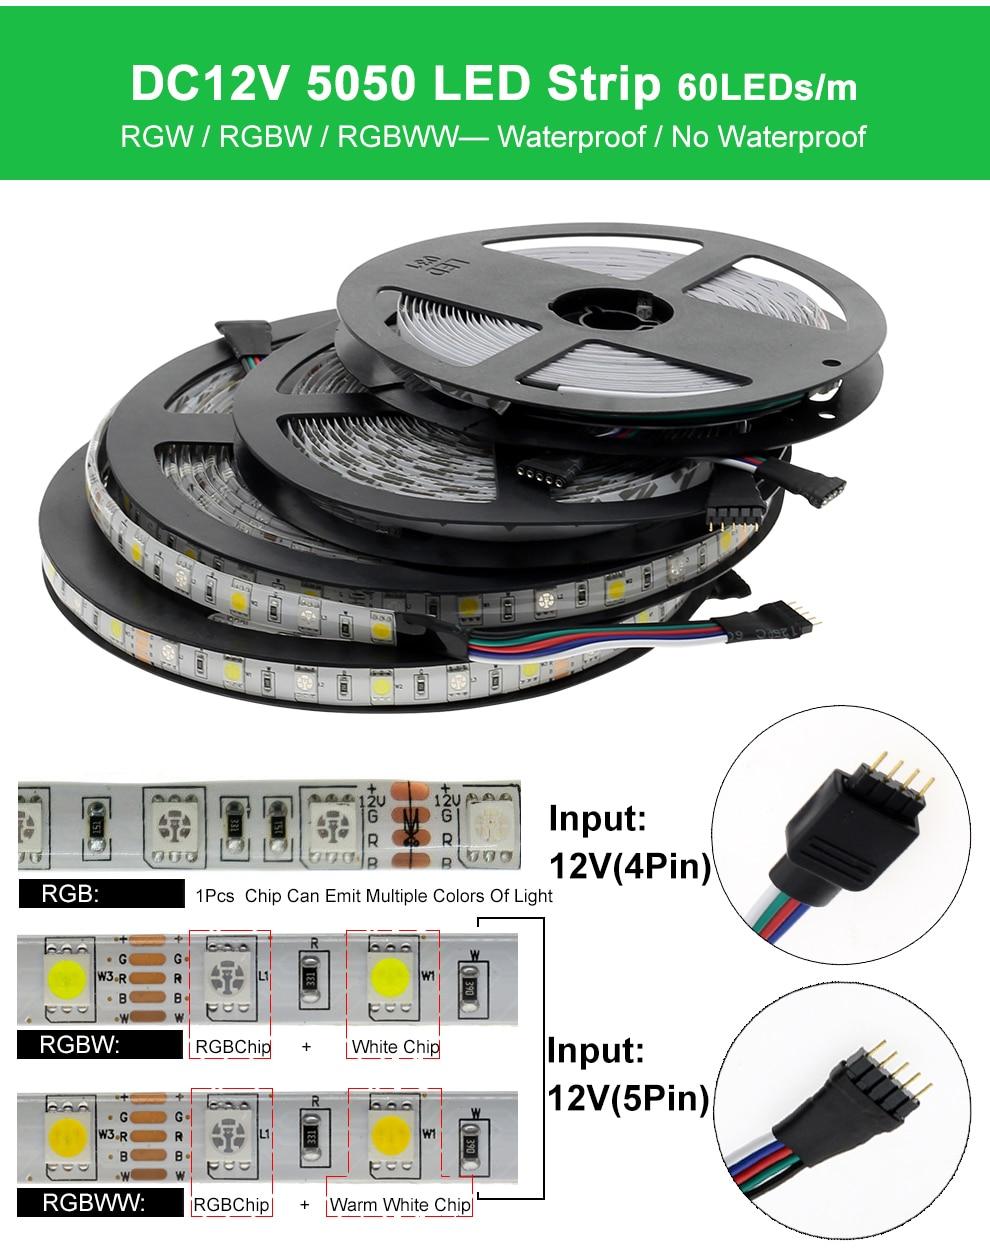 HTB12p1MeRKw3KVjSZTEq6AuRpXaE 5050 LED Strip RGB / RGBW / RGBWW 5M 300LEDs RGB Color Changeable Flexible LED Light + Remote Controller + 12V 3A Power Adapter